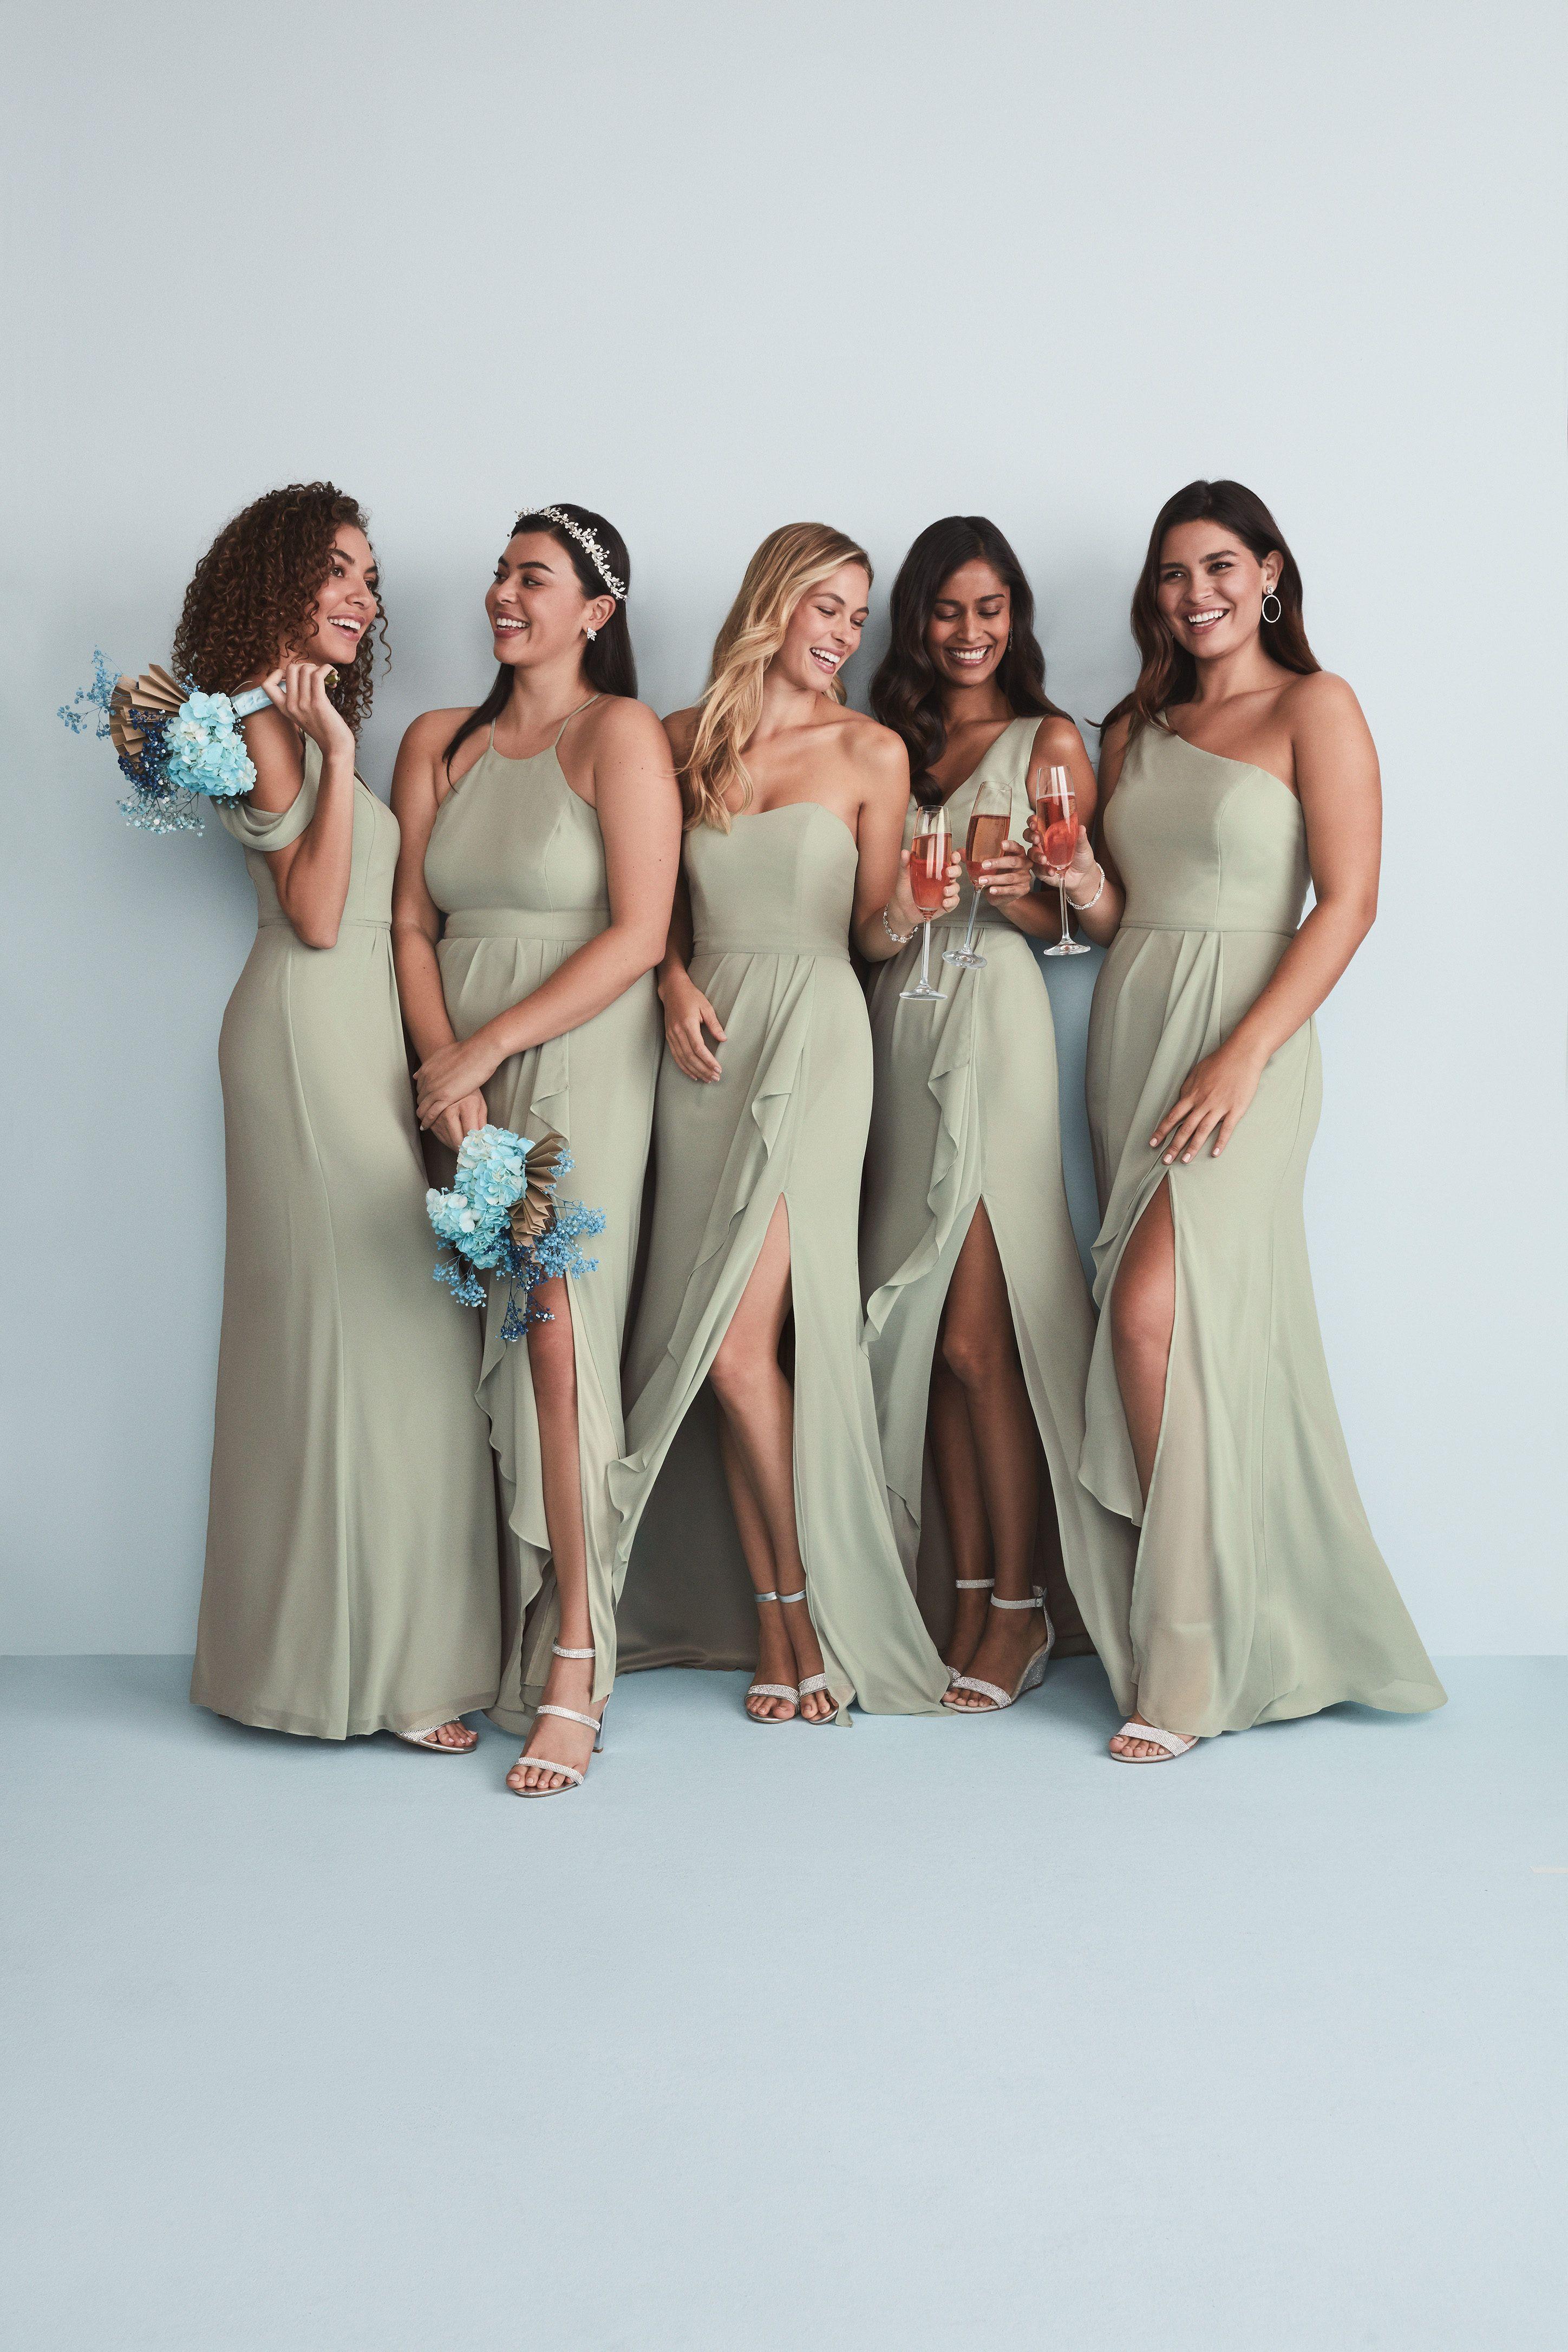 Chiffon Cascade Bridesmaid Dress In 2020 Bridesmaid Dresses Online Bridesmaid Dress Styles Davids Bridal Bridesmaid Dresses